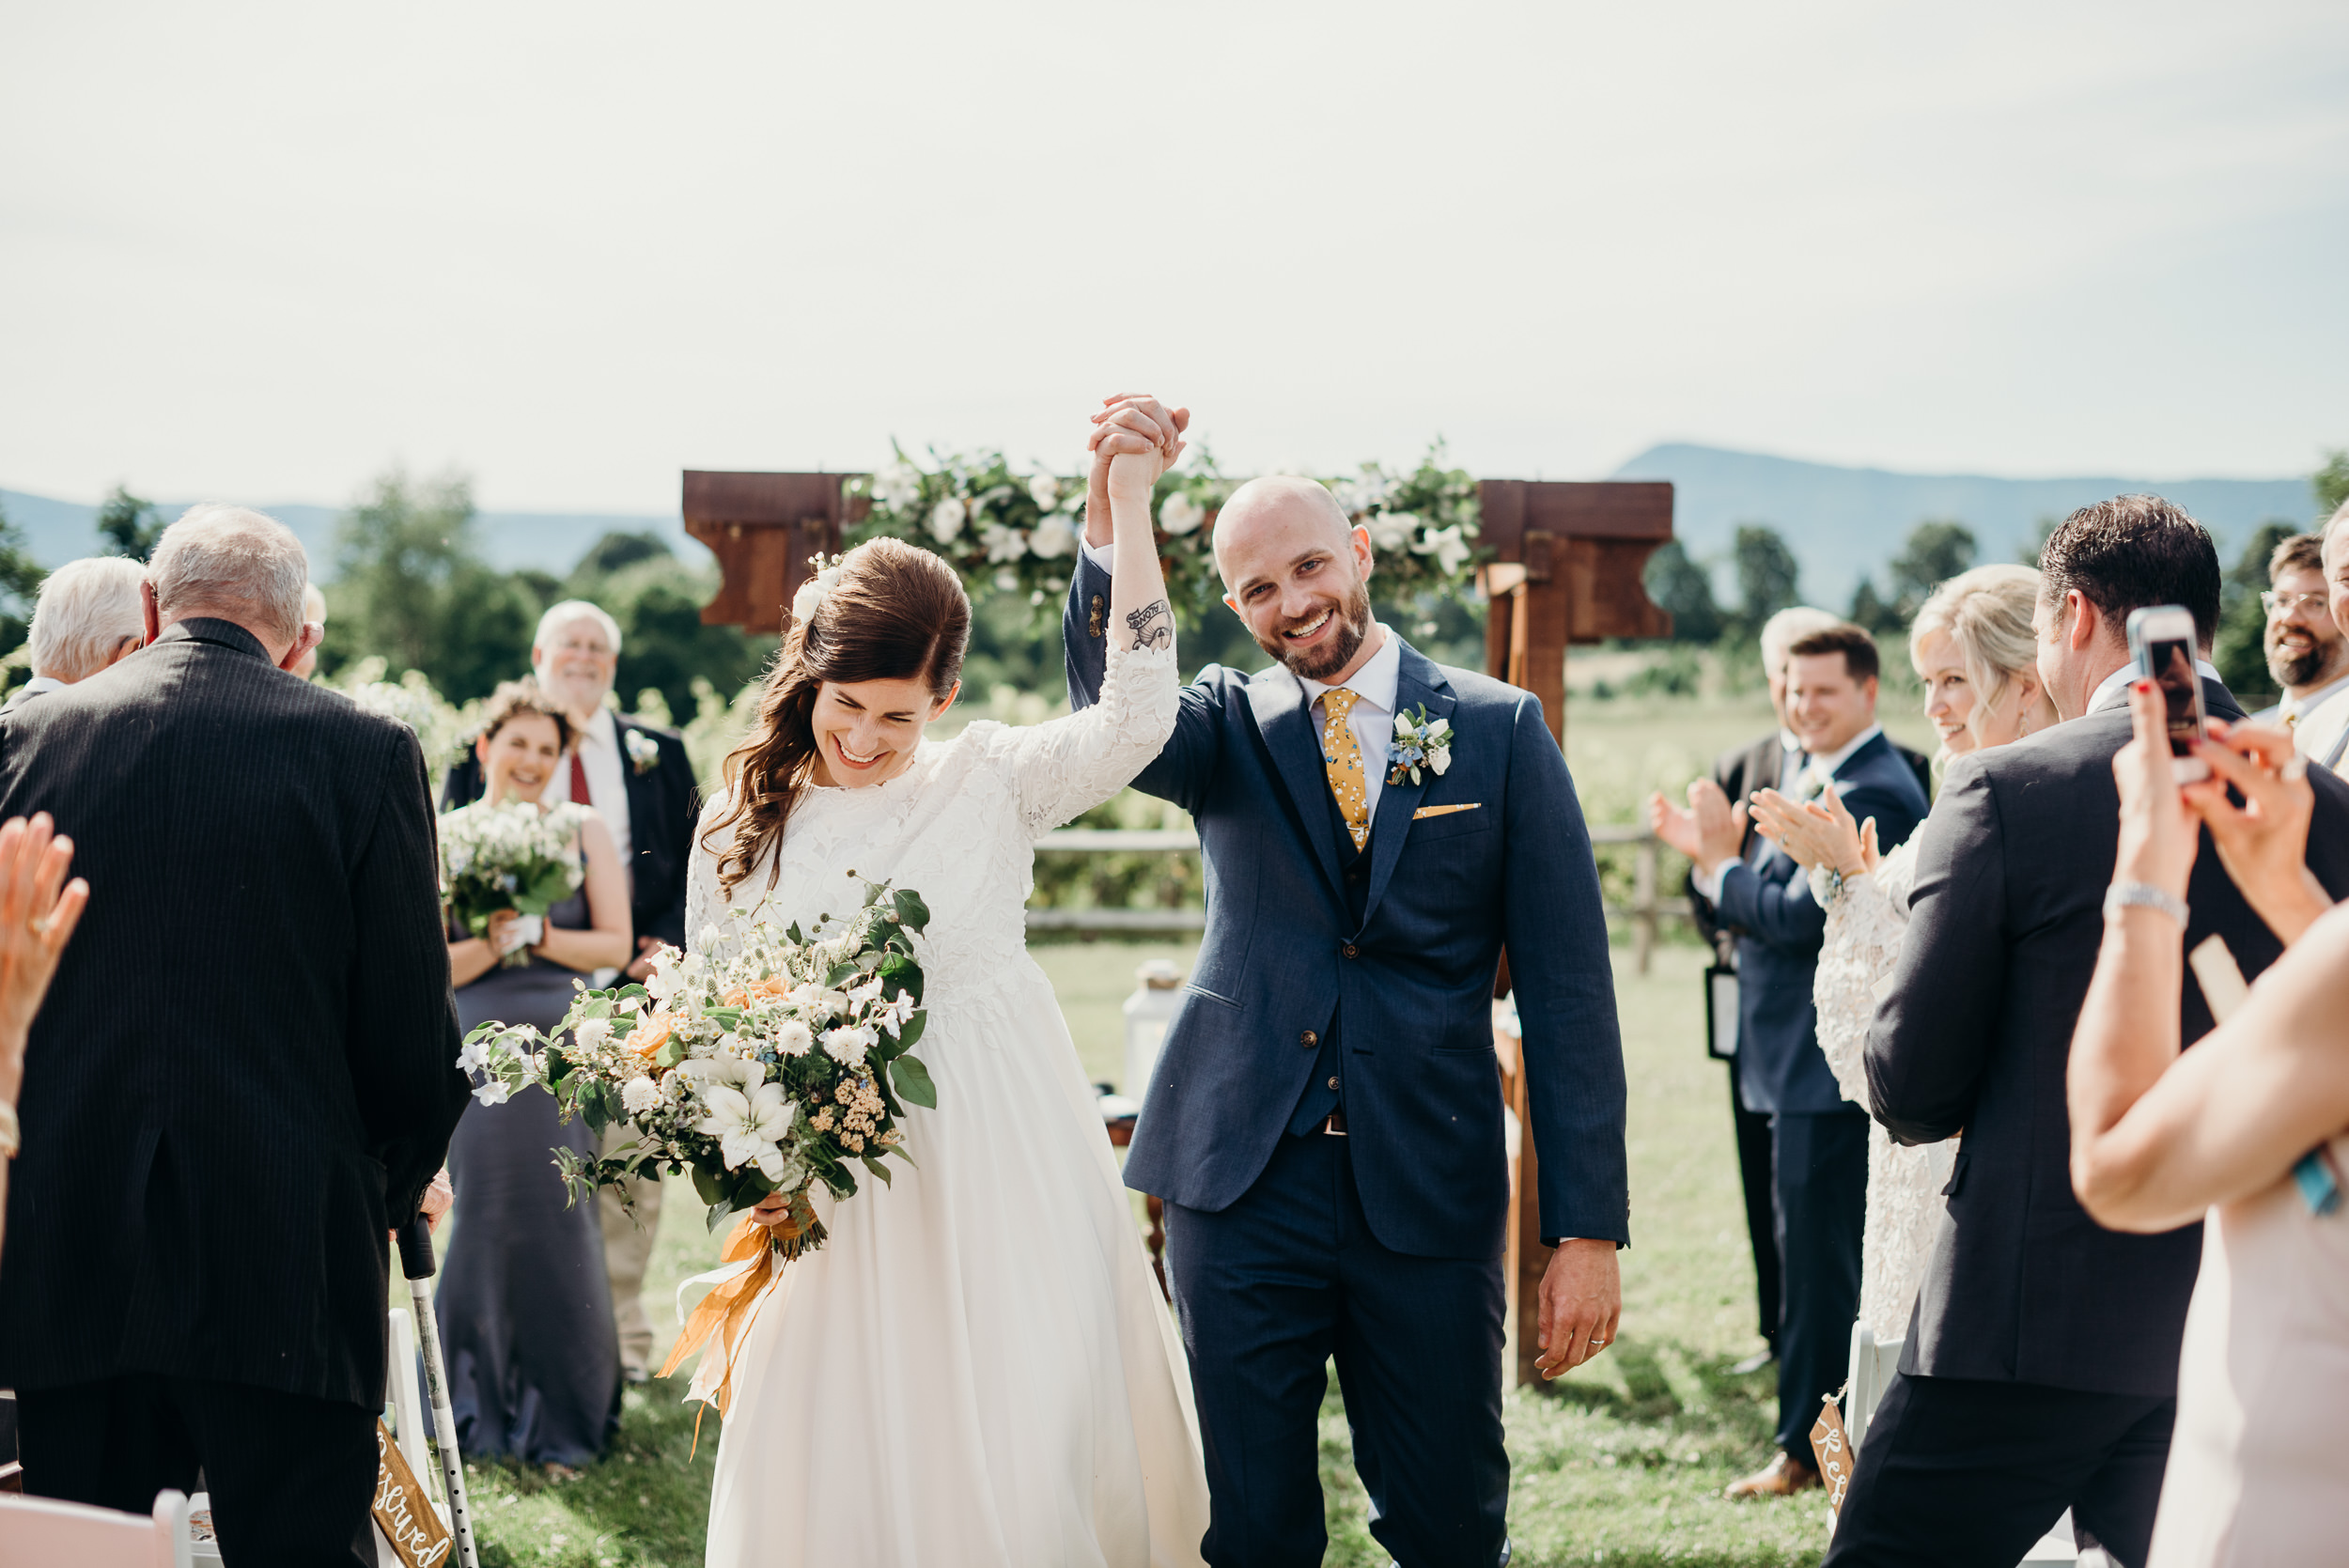 137-faithbrooke-barn-vineyard-wedding-photo-mustard-yellow-navy-motorcycle-MGP_2259.jpg